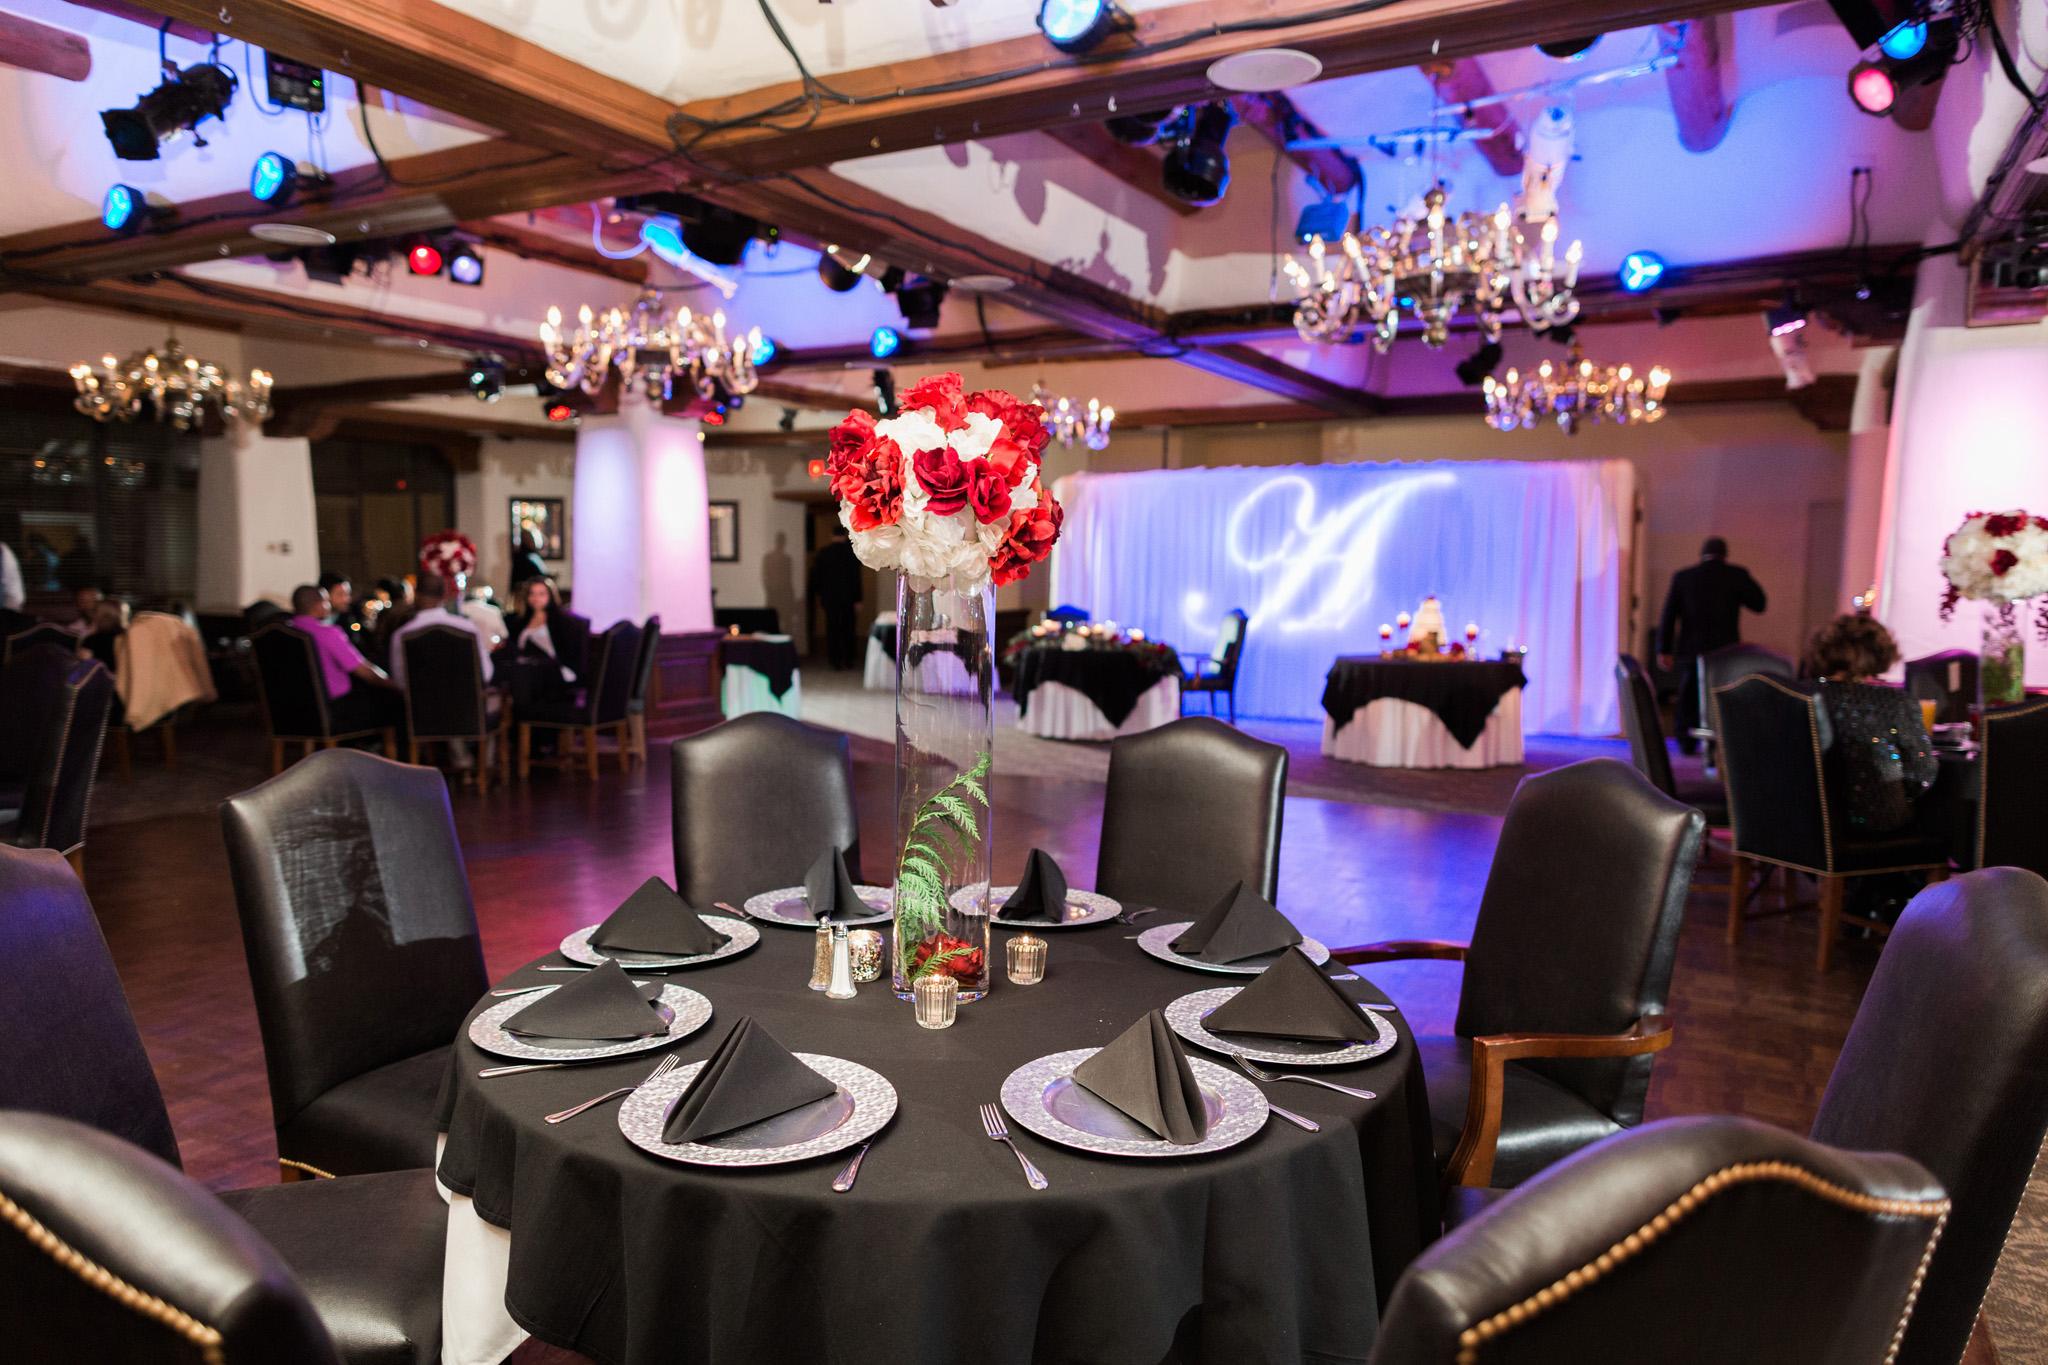 Wedding Reception Venues In Wichita Ks Best Wichita